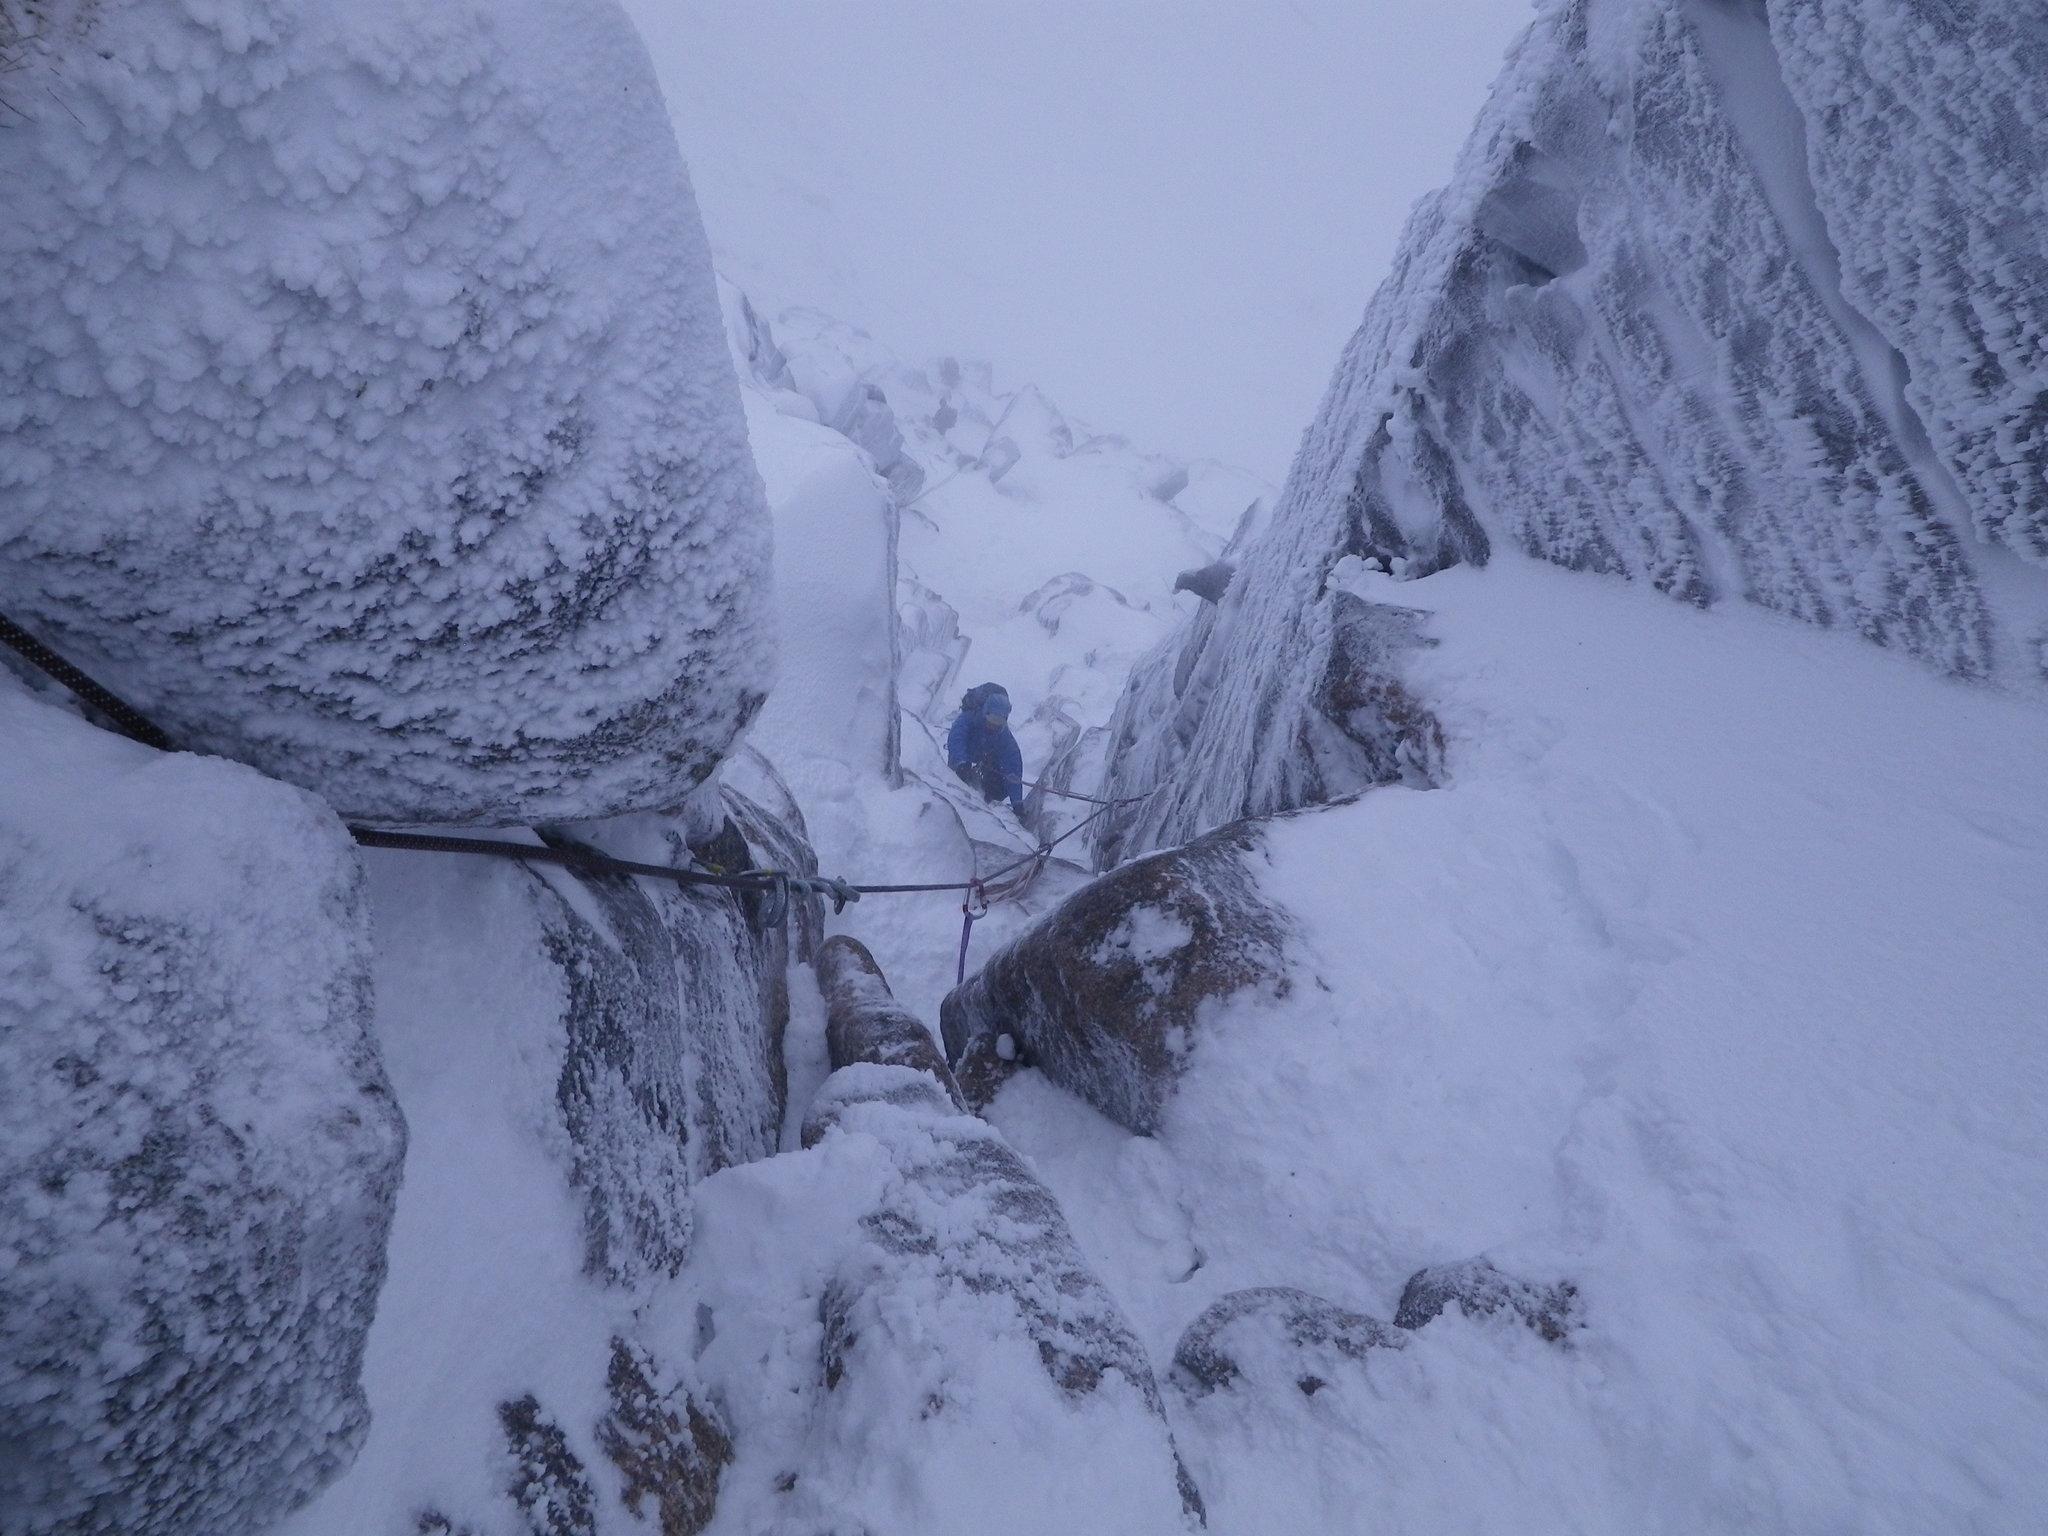 SW 12.01 01 Scotland Uni Cumbria winter climbing rs.jpg